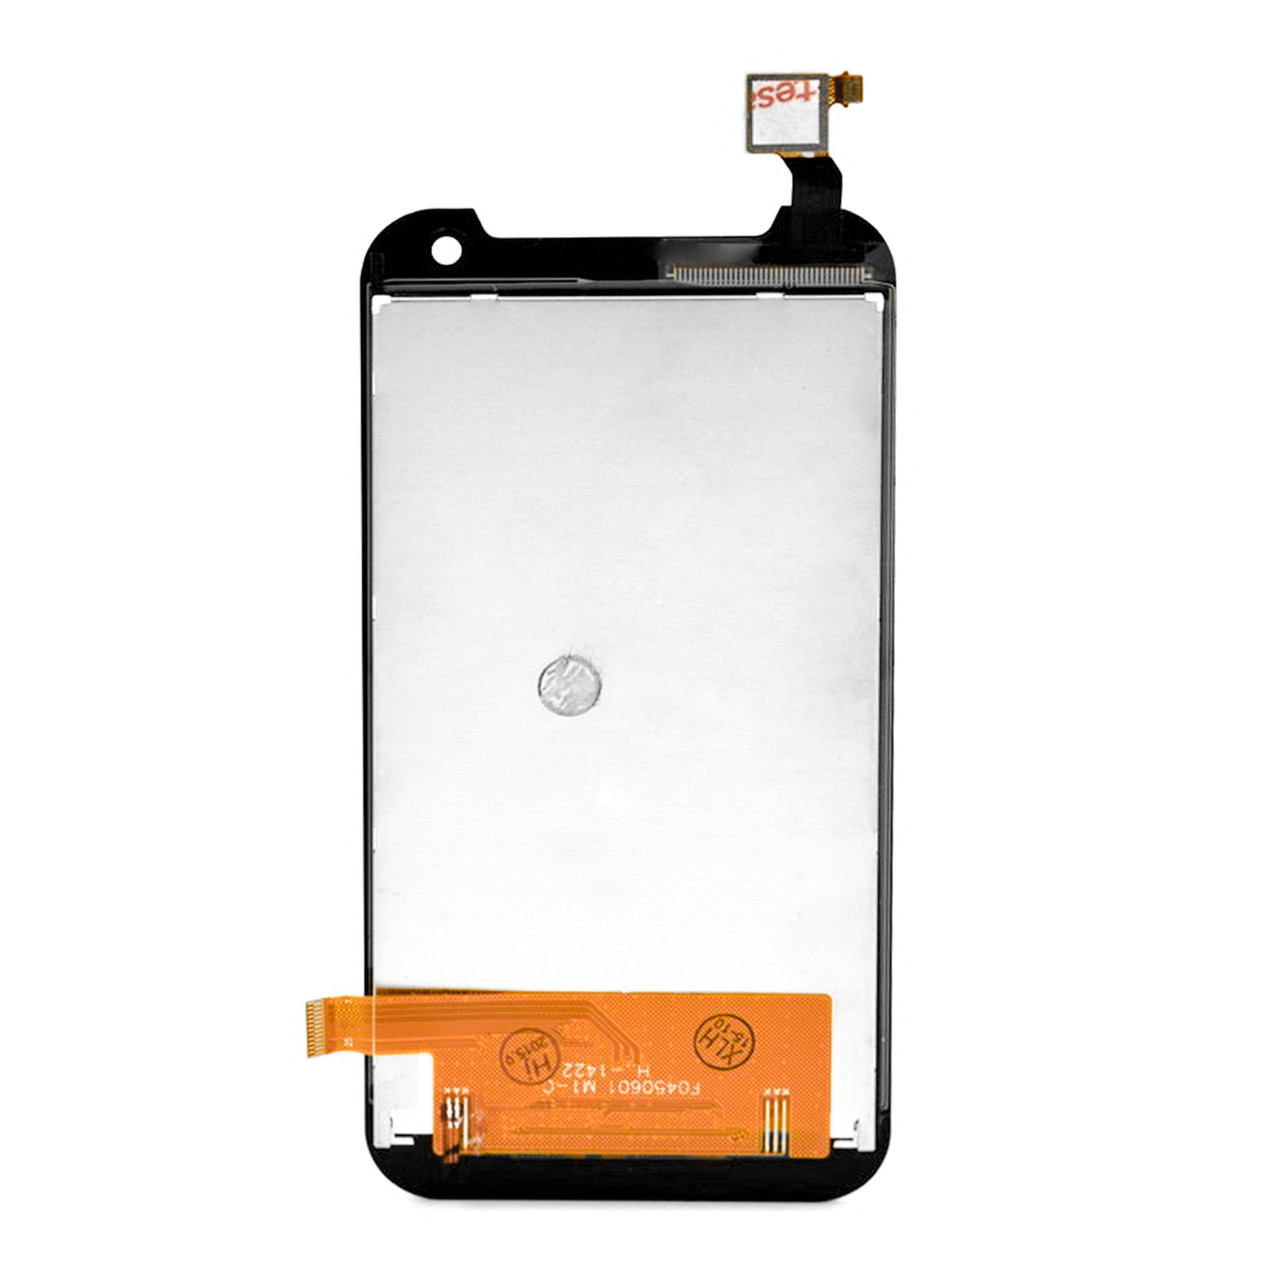 Дисплей HTC Desire 310 в сборе Black (31)